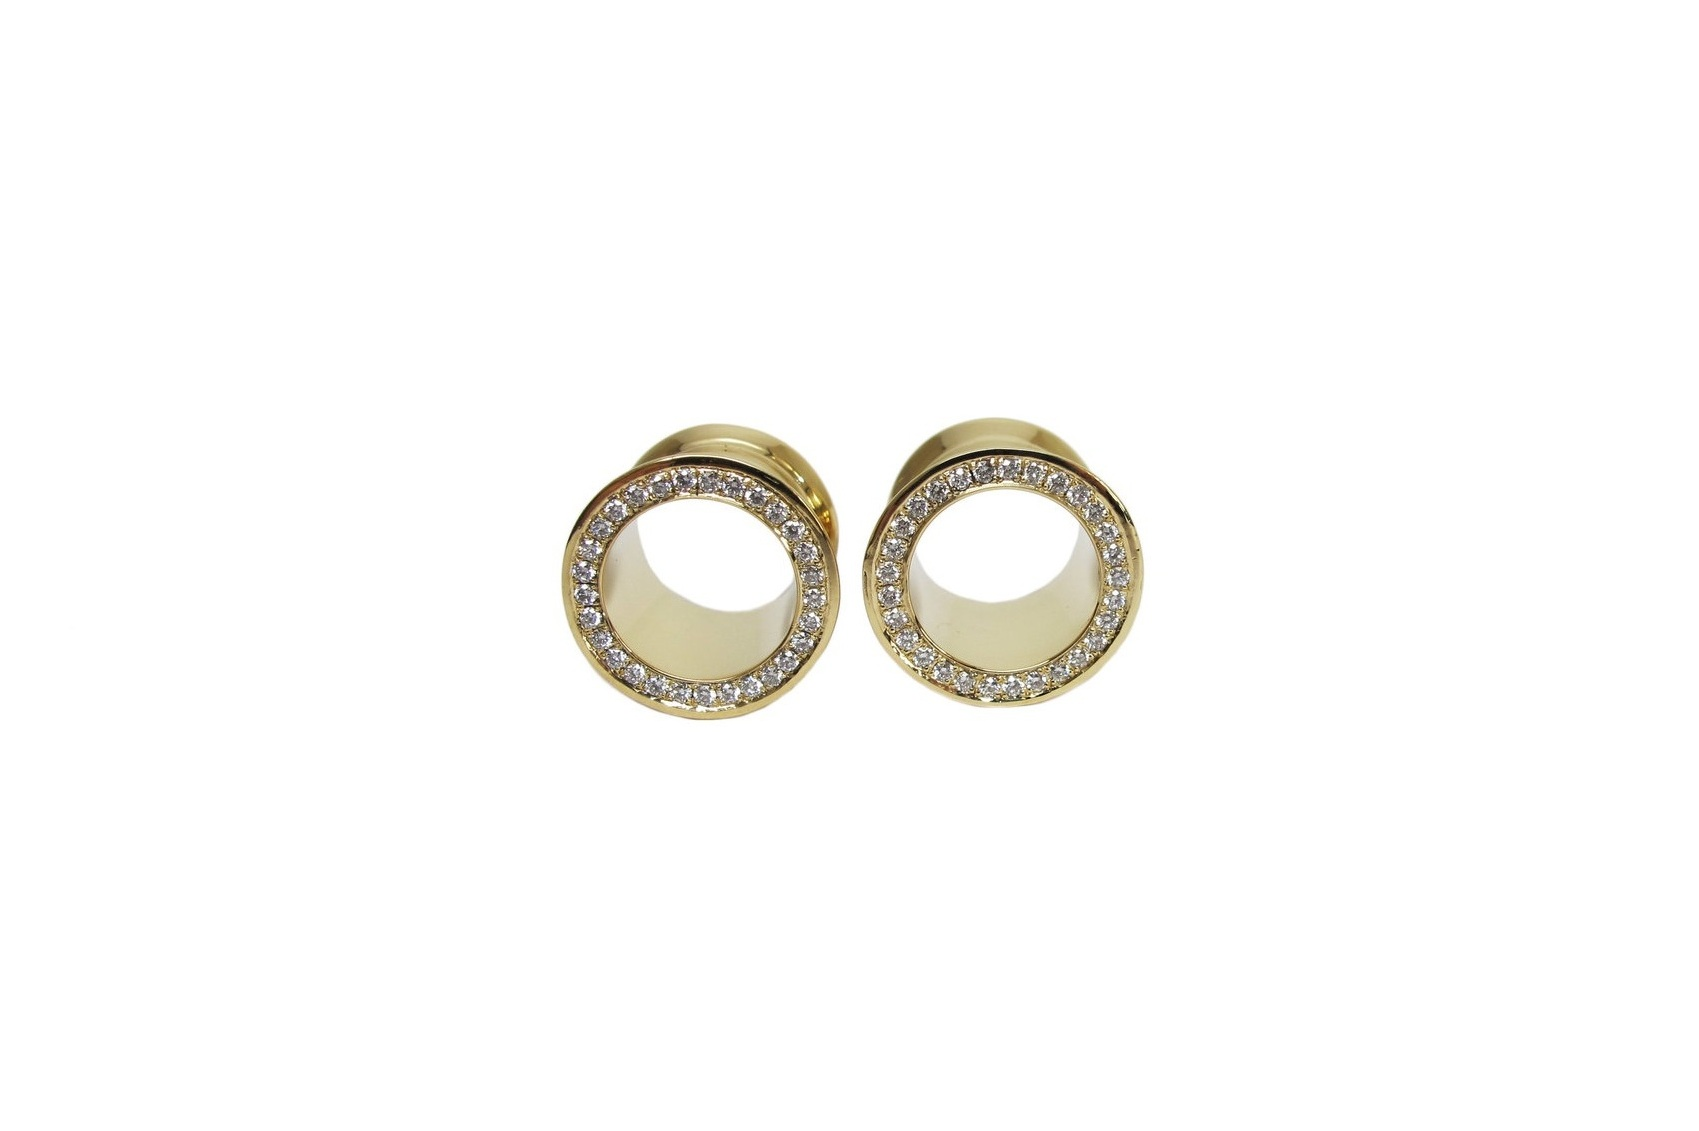 18K GOLD + MICRO PAVÉ DIAMOND EYELETS